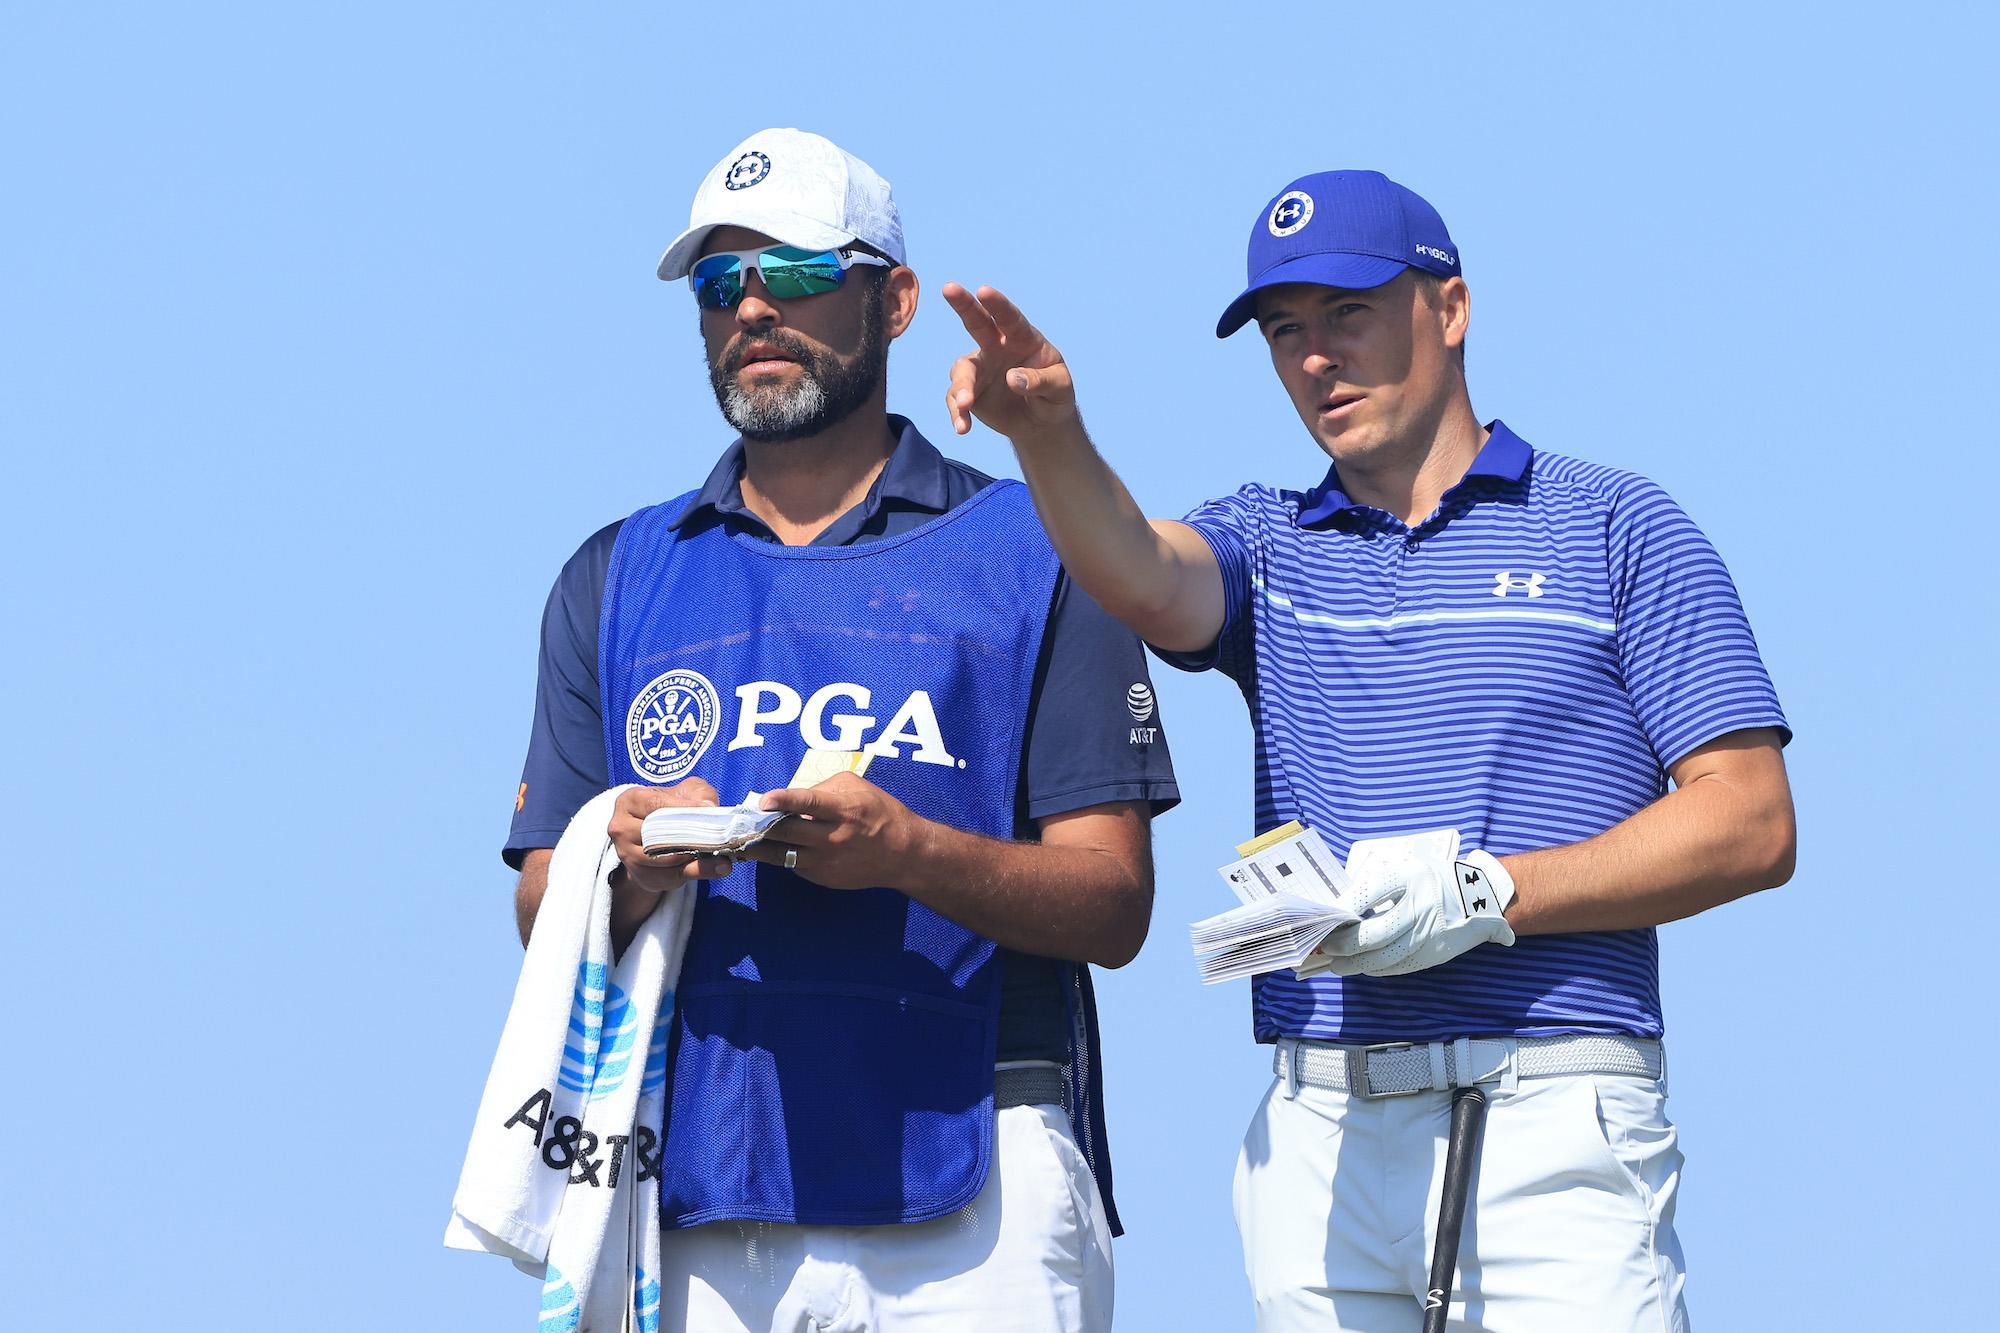 2021 PGA Championship: Round 2 - Jordan and Michael Talk on No. 15